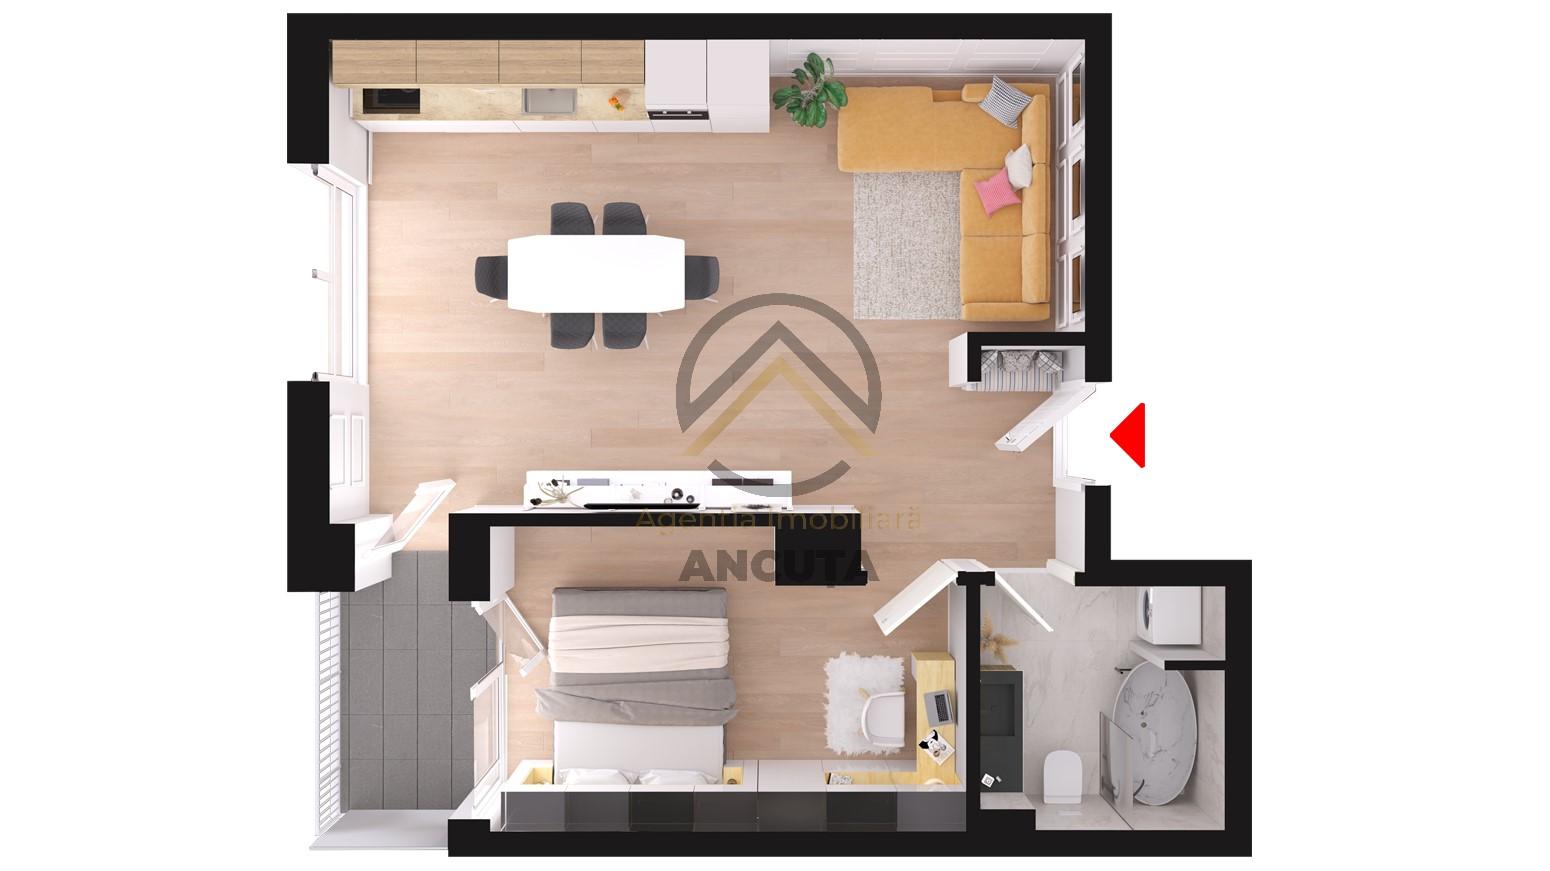 Apartament_2_camere_Columna_sc1_corp_C_55,37_ap8_14_20_26_32_38_44_0